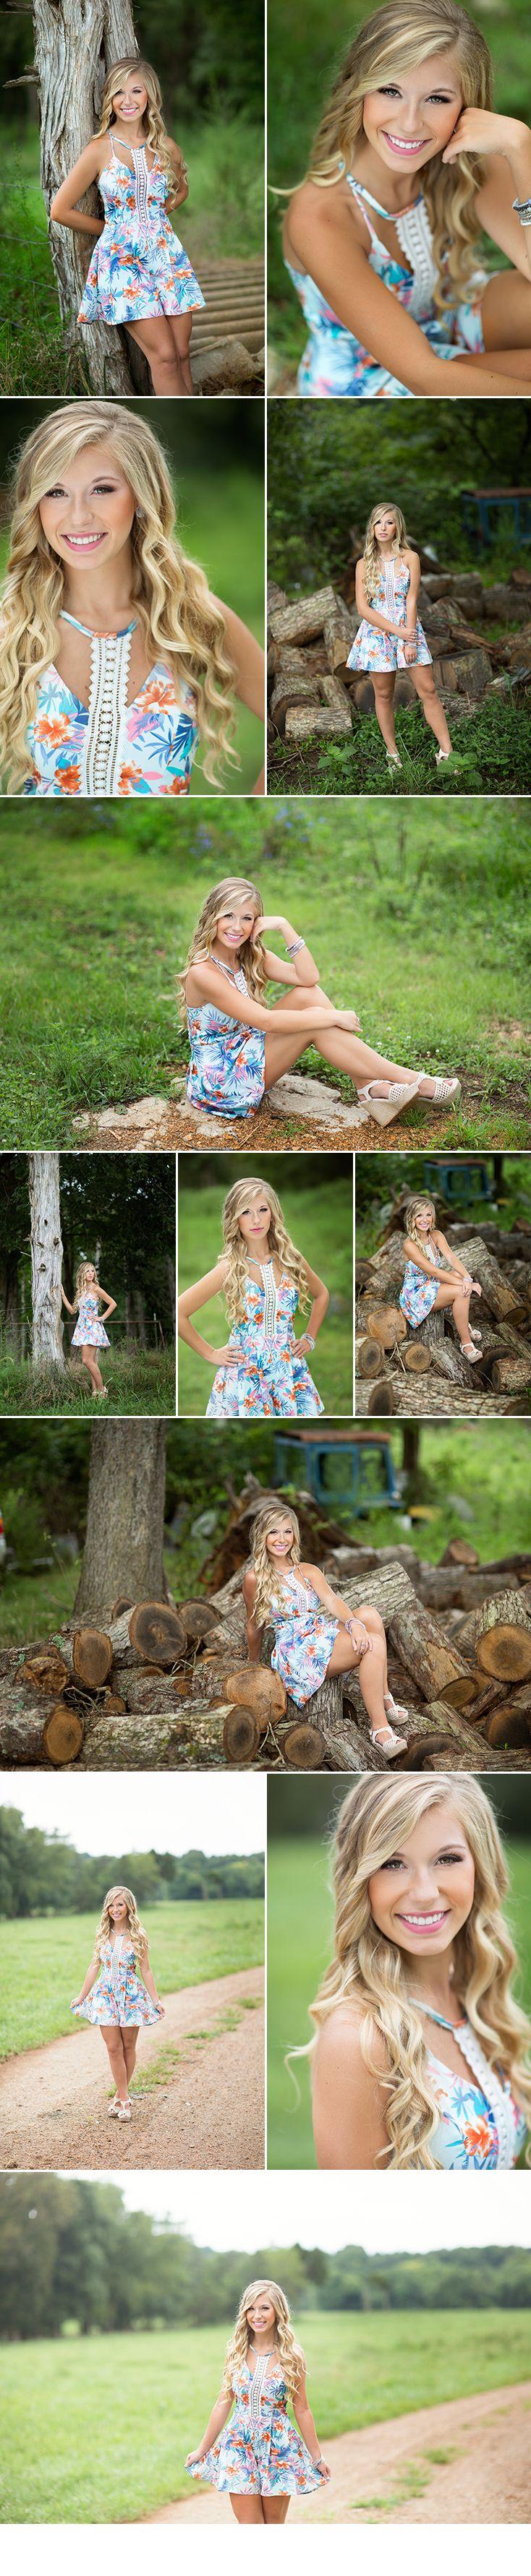 d-Squared Designs St. Louis, MO Senior Photography, Farm senior. Summer dress. Gorgeous senior. Blonde senior. Senior girl posing ideas. De 8 ani cele mai funky albume de absolvire - 0725860983 - www.ceimaifrumosiani.ro